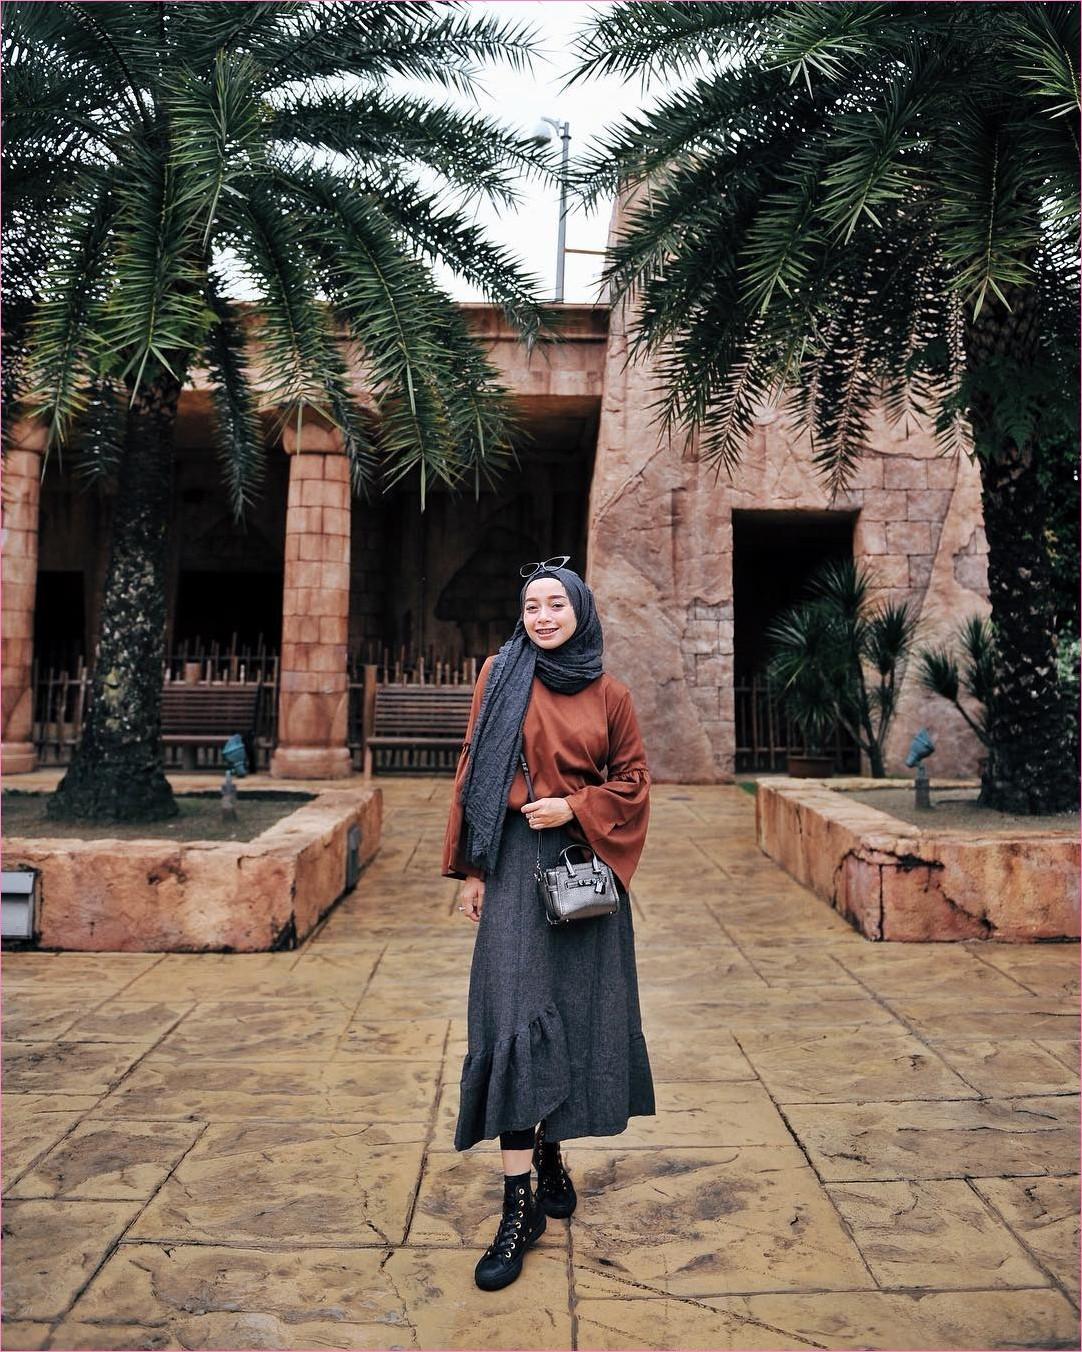 Outfit Rok Untuk Hijabers Ala Selebgram 2018 ankle boots hitam hijab pashmina rawis rok A-line skirt abu tua blouse tunic lengan lebar coklat slingbags kacamata hitam legging ootd trendy